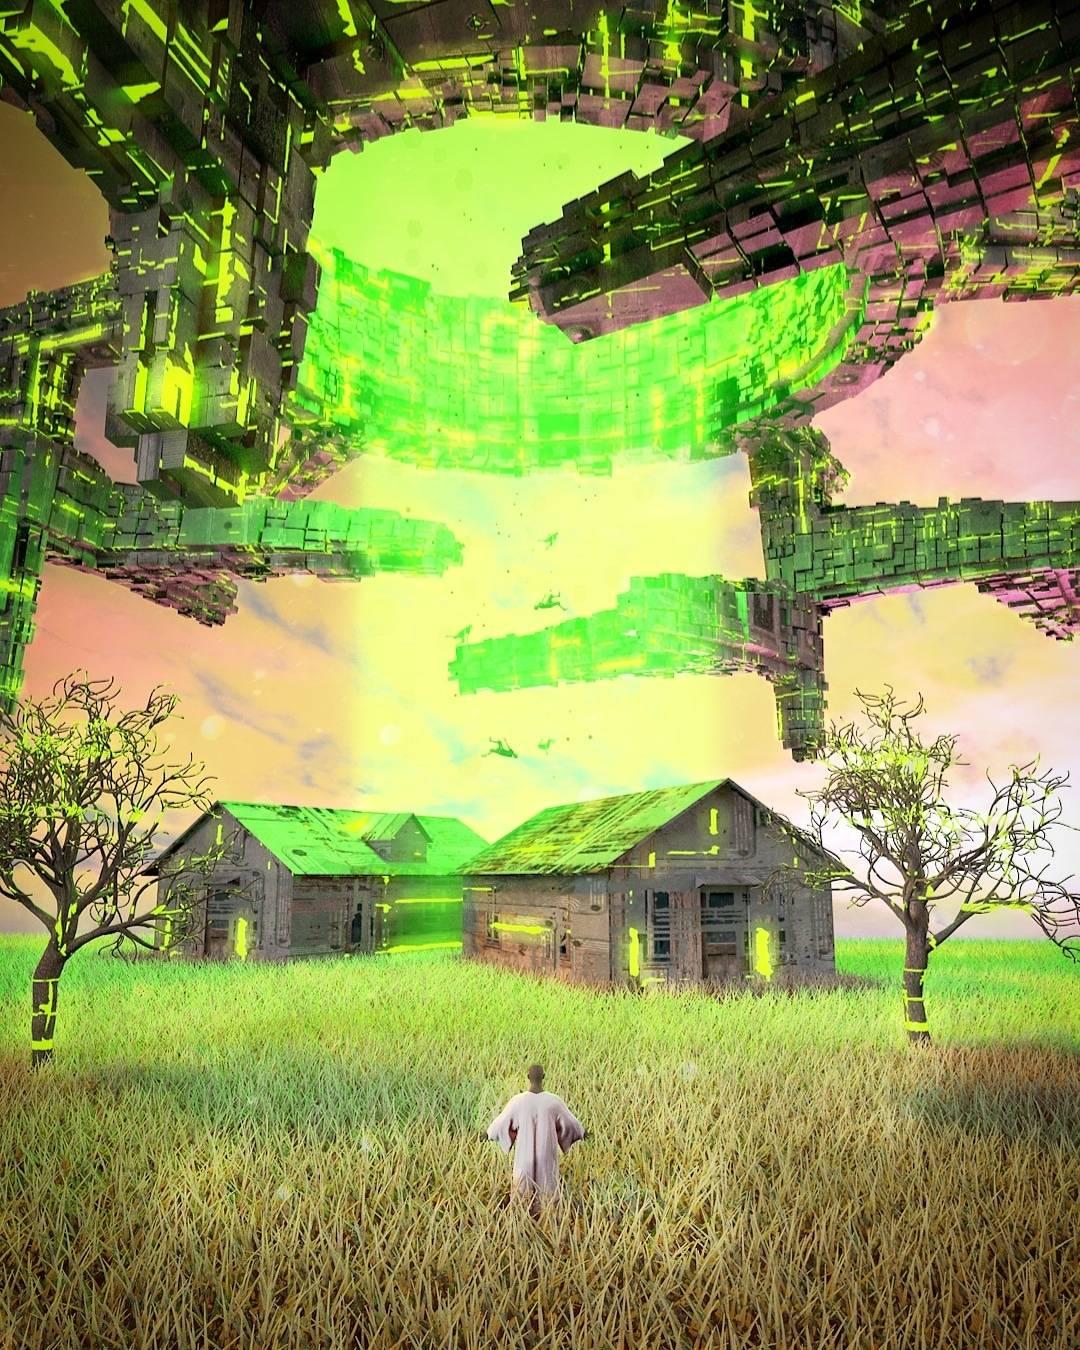 rural-radioactive-rapture-by-kyrill-popeye-eniveo7m7o-1080x1350.jpg